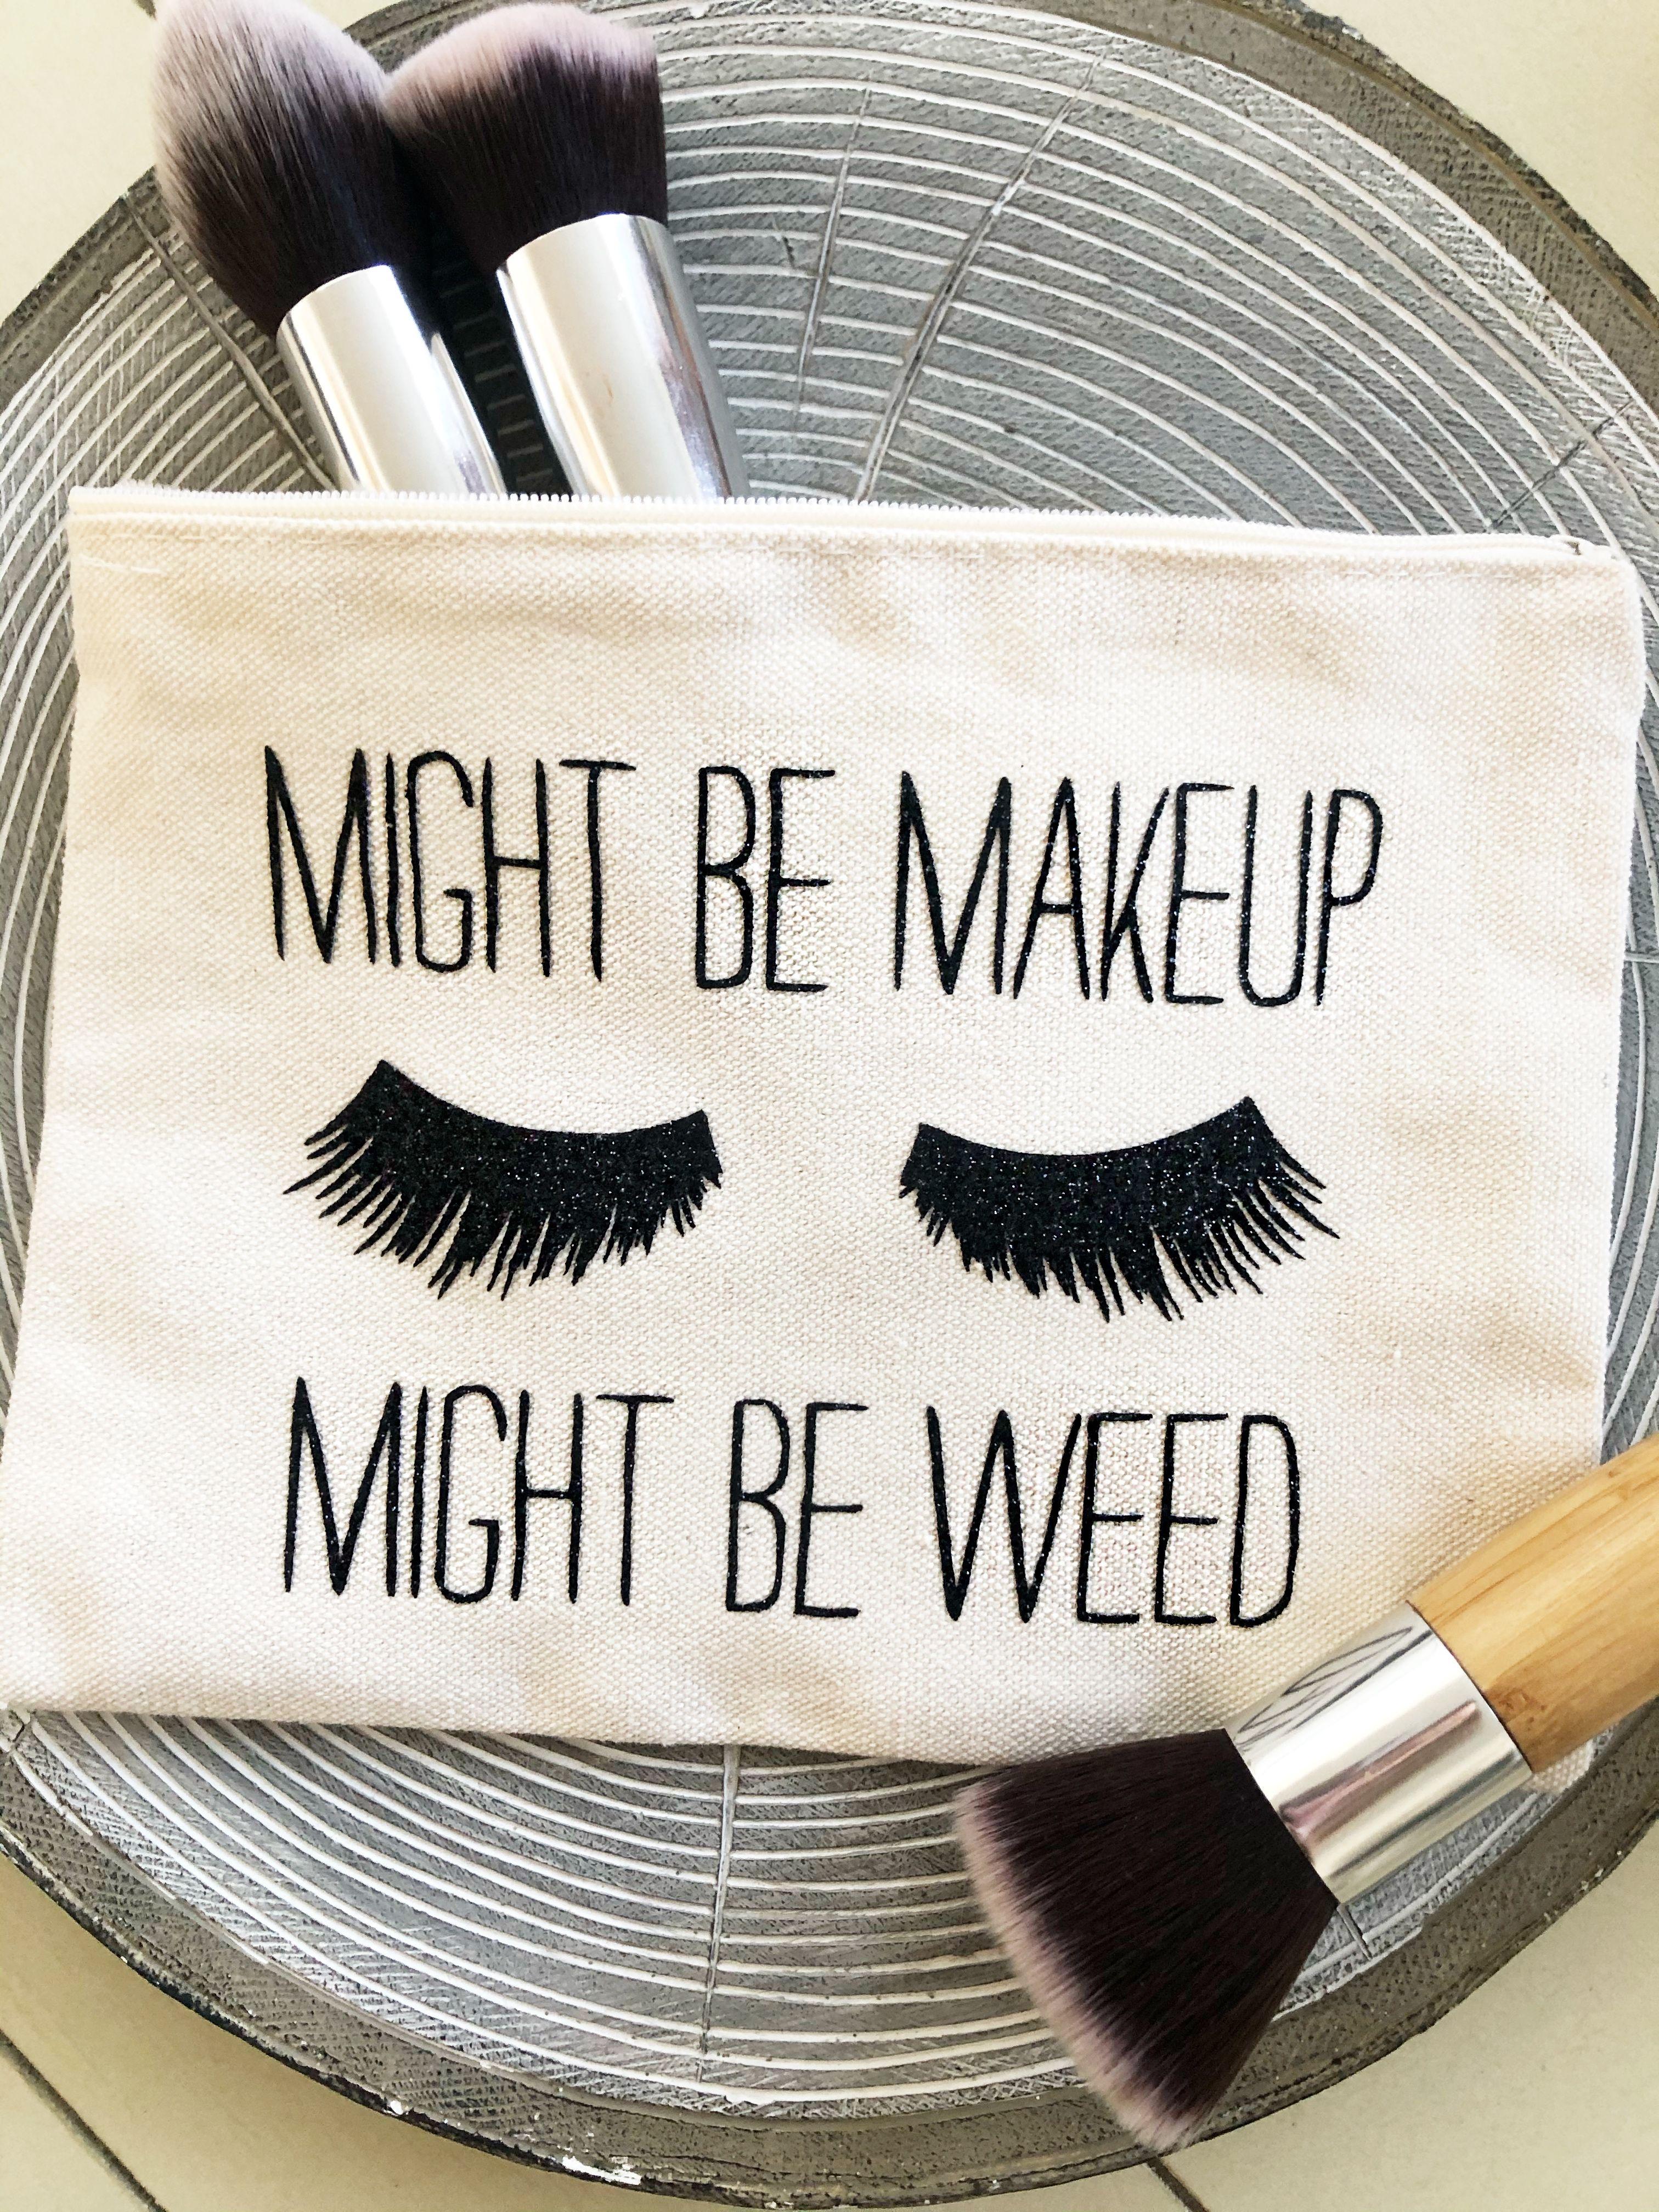 Makeup Bag Personalized Makeup Bag Make Up Bag Small